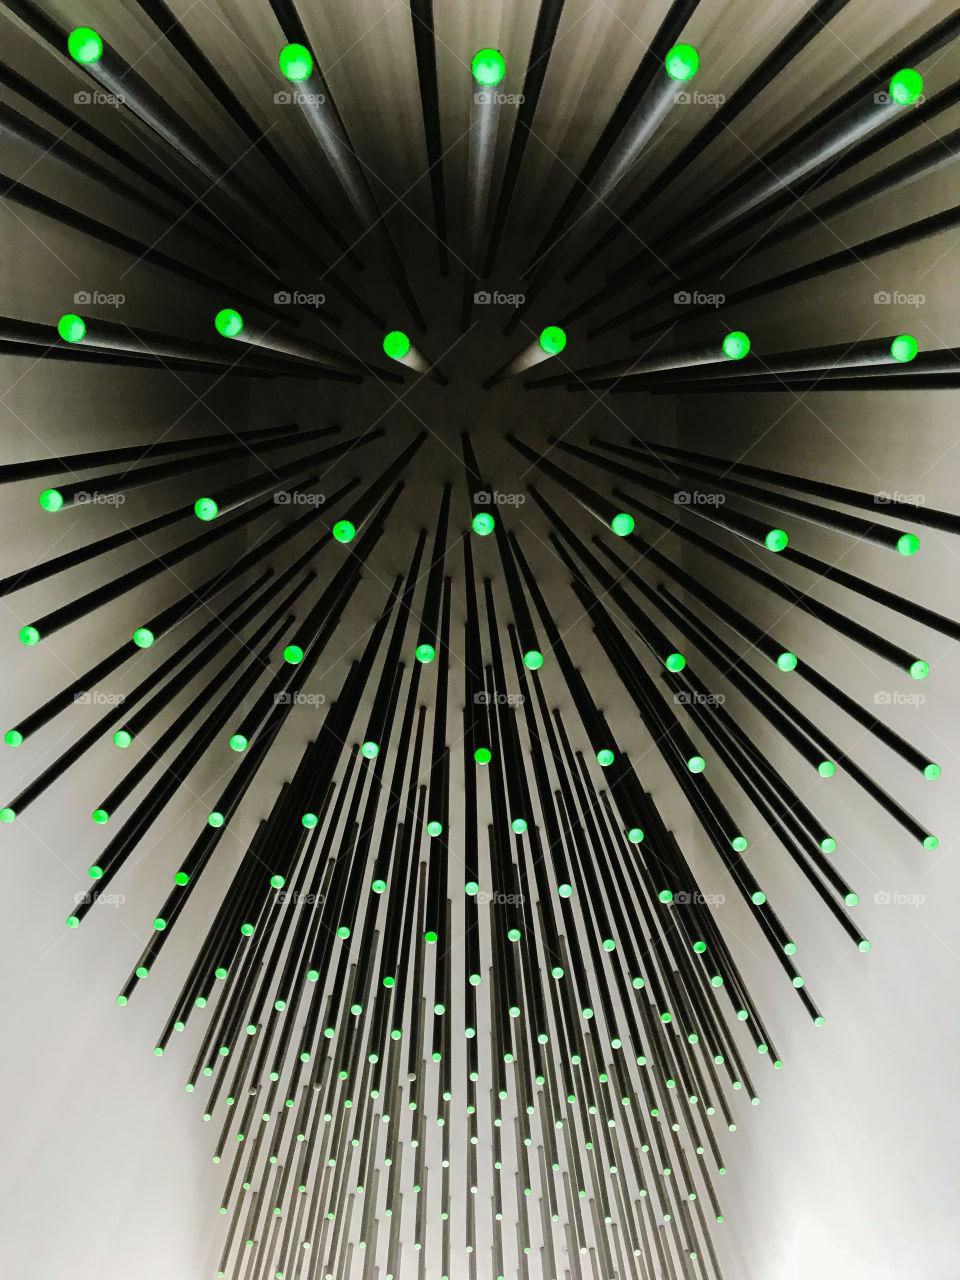 Spikes of light